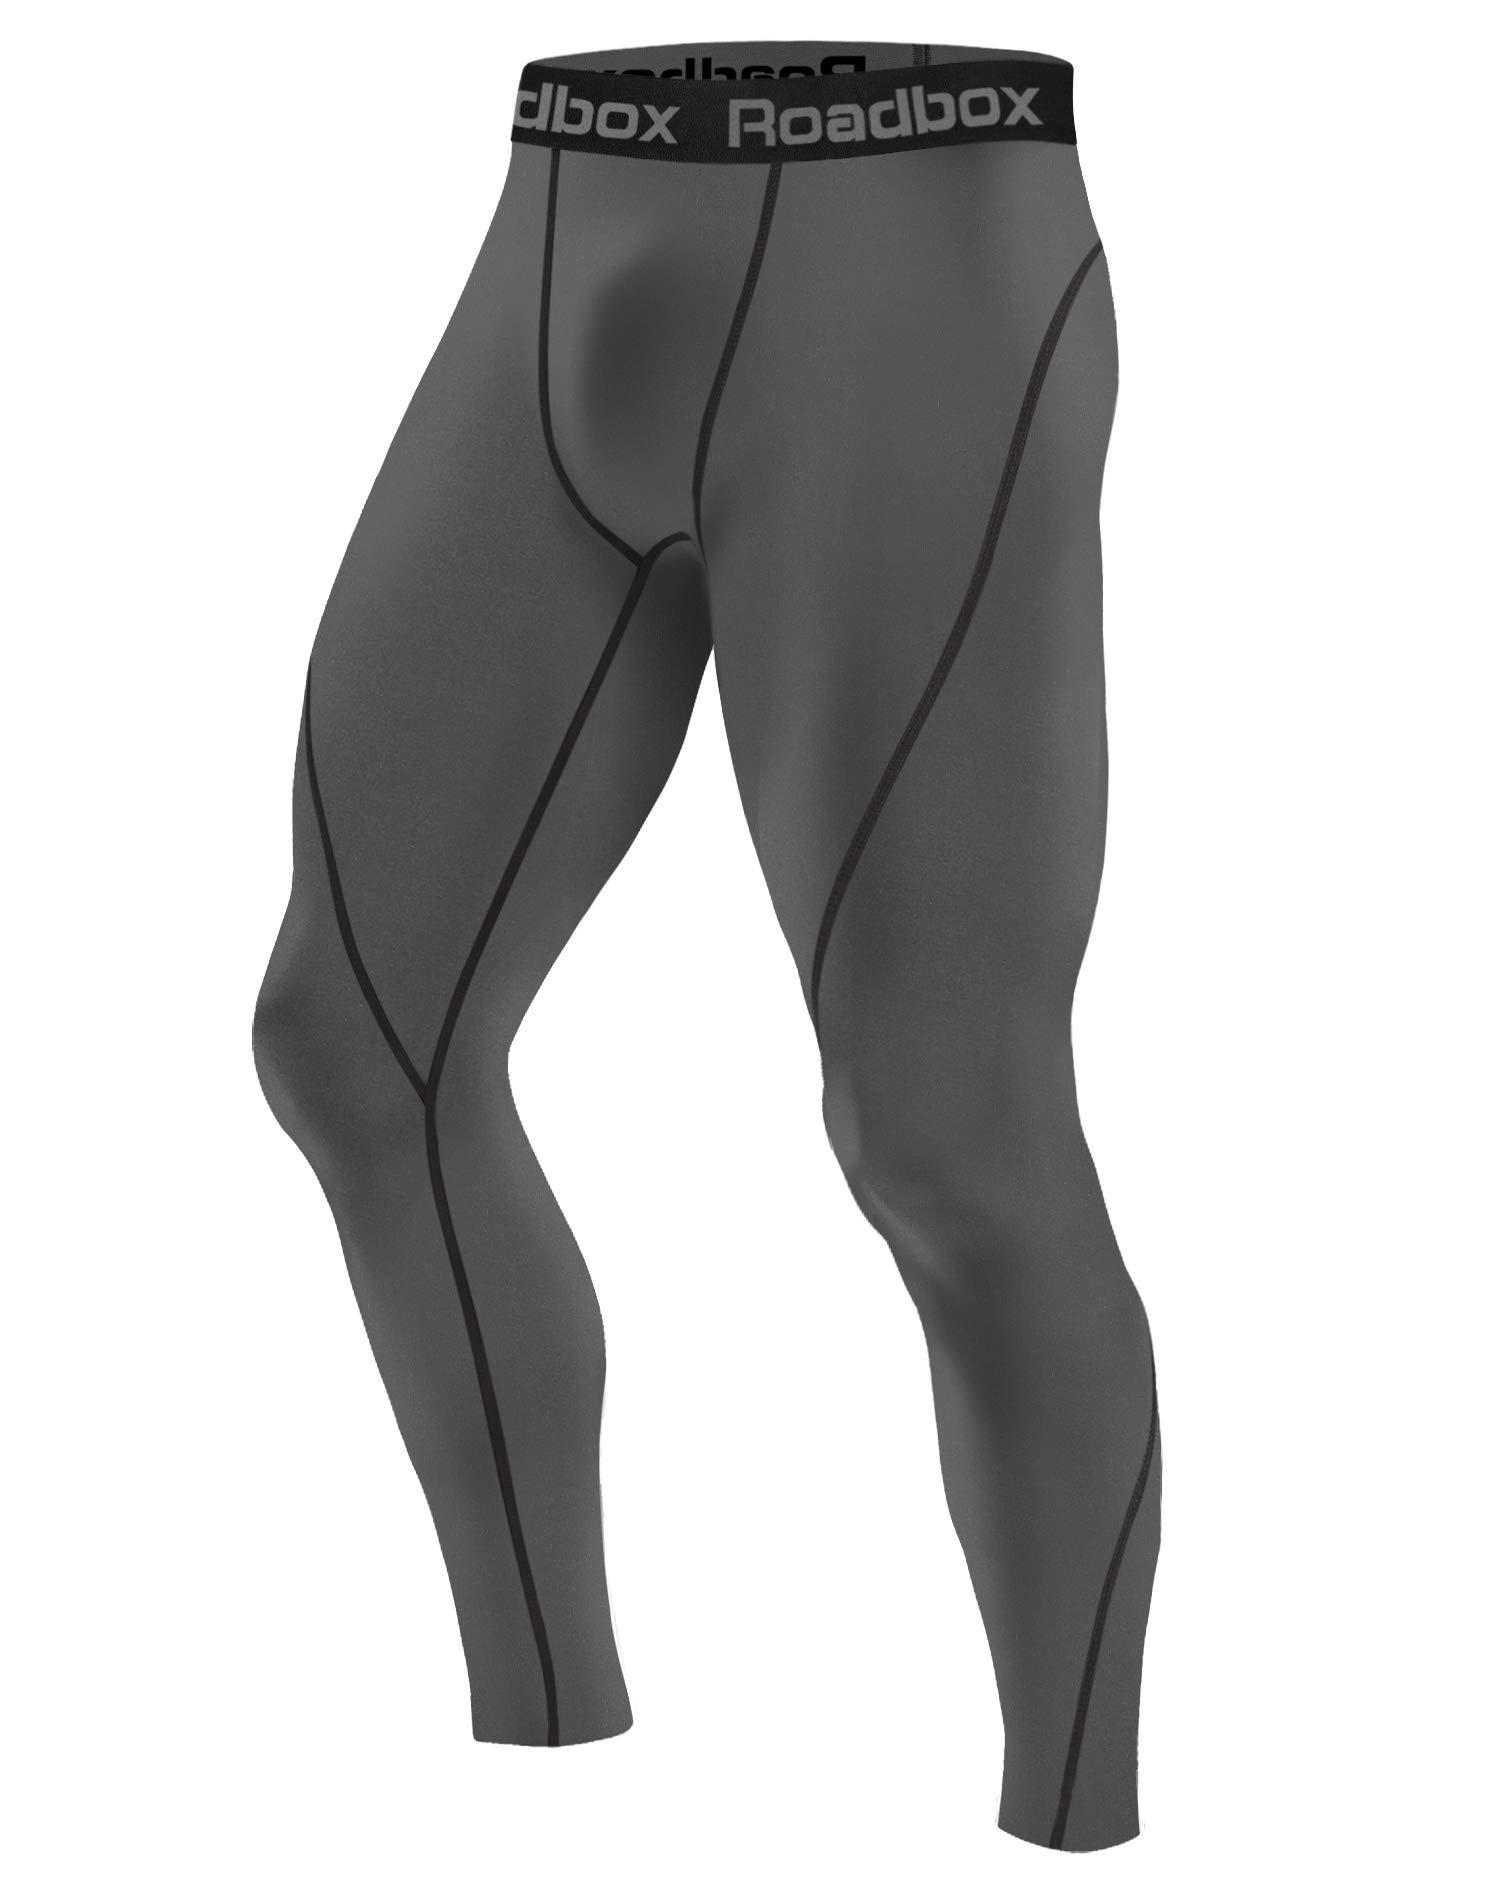 Roadbox Men's Compression Pants Base Layer Cool Dry Tights Leggings